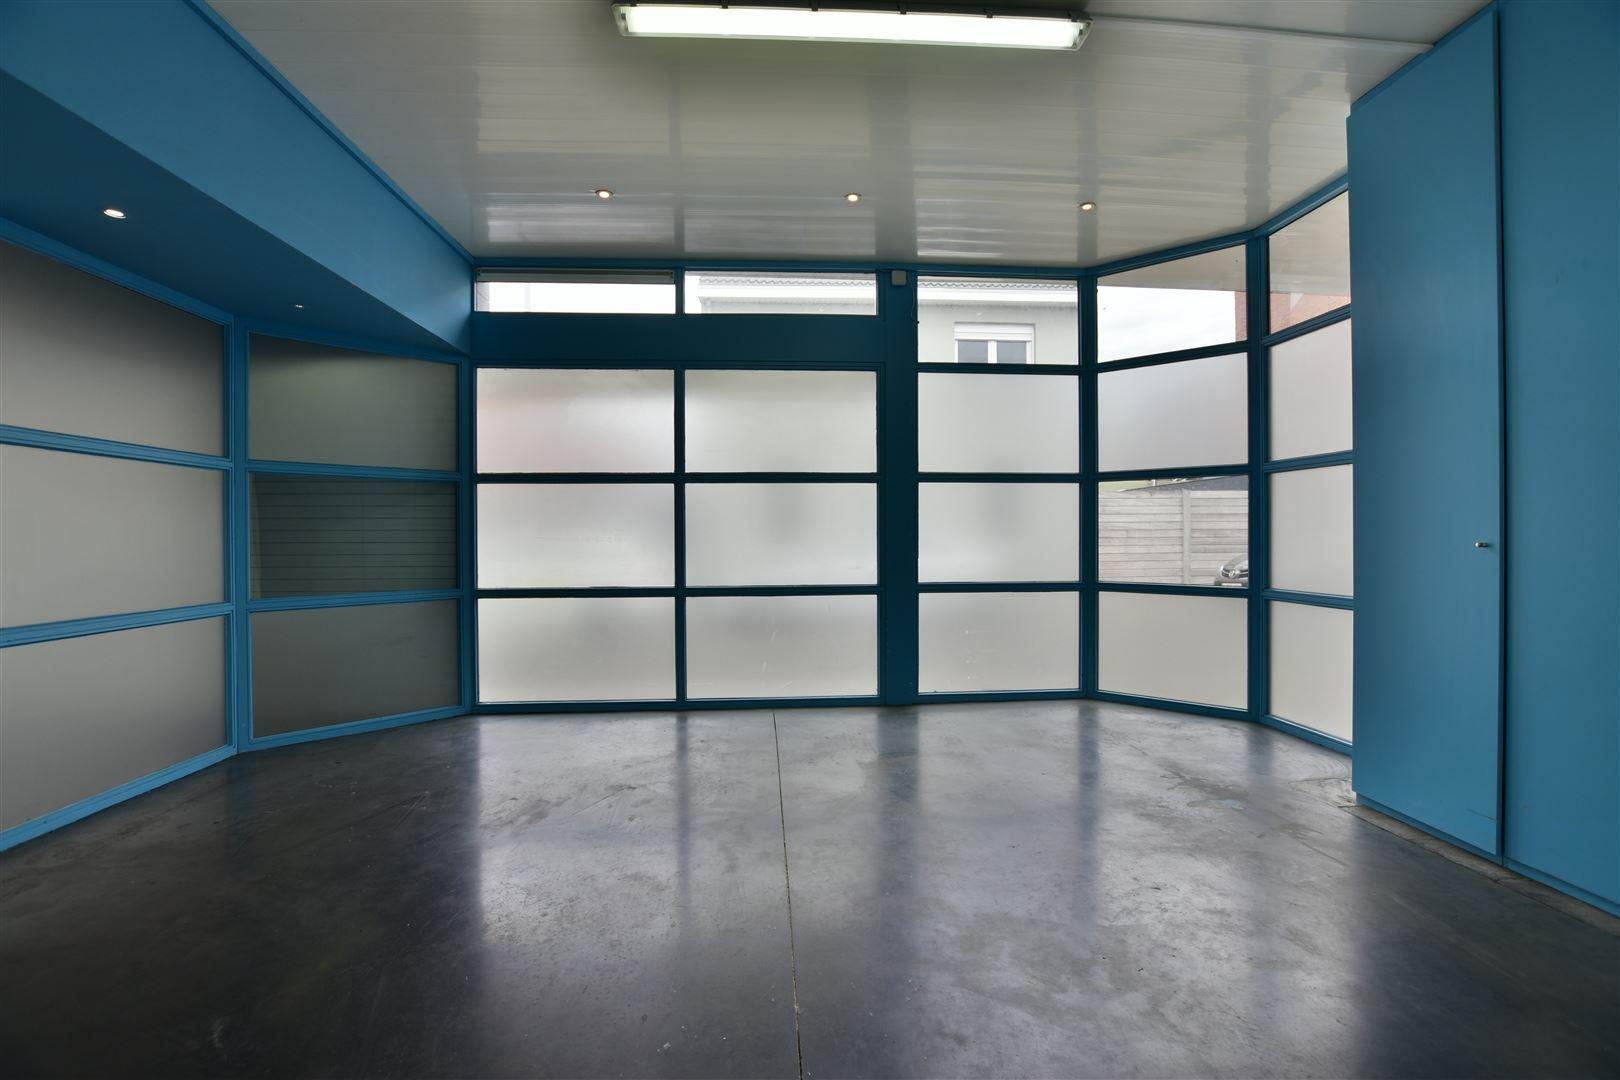 Foto 4 : Kantoorruimte te 9220 HAMME (België) - Prijs € 1.600